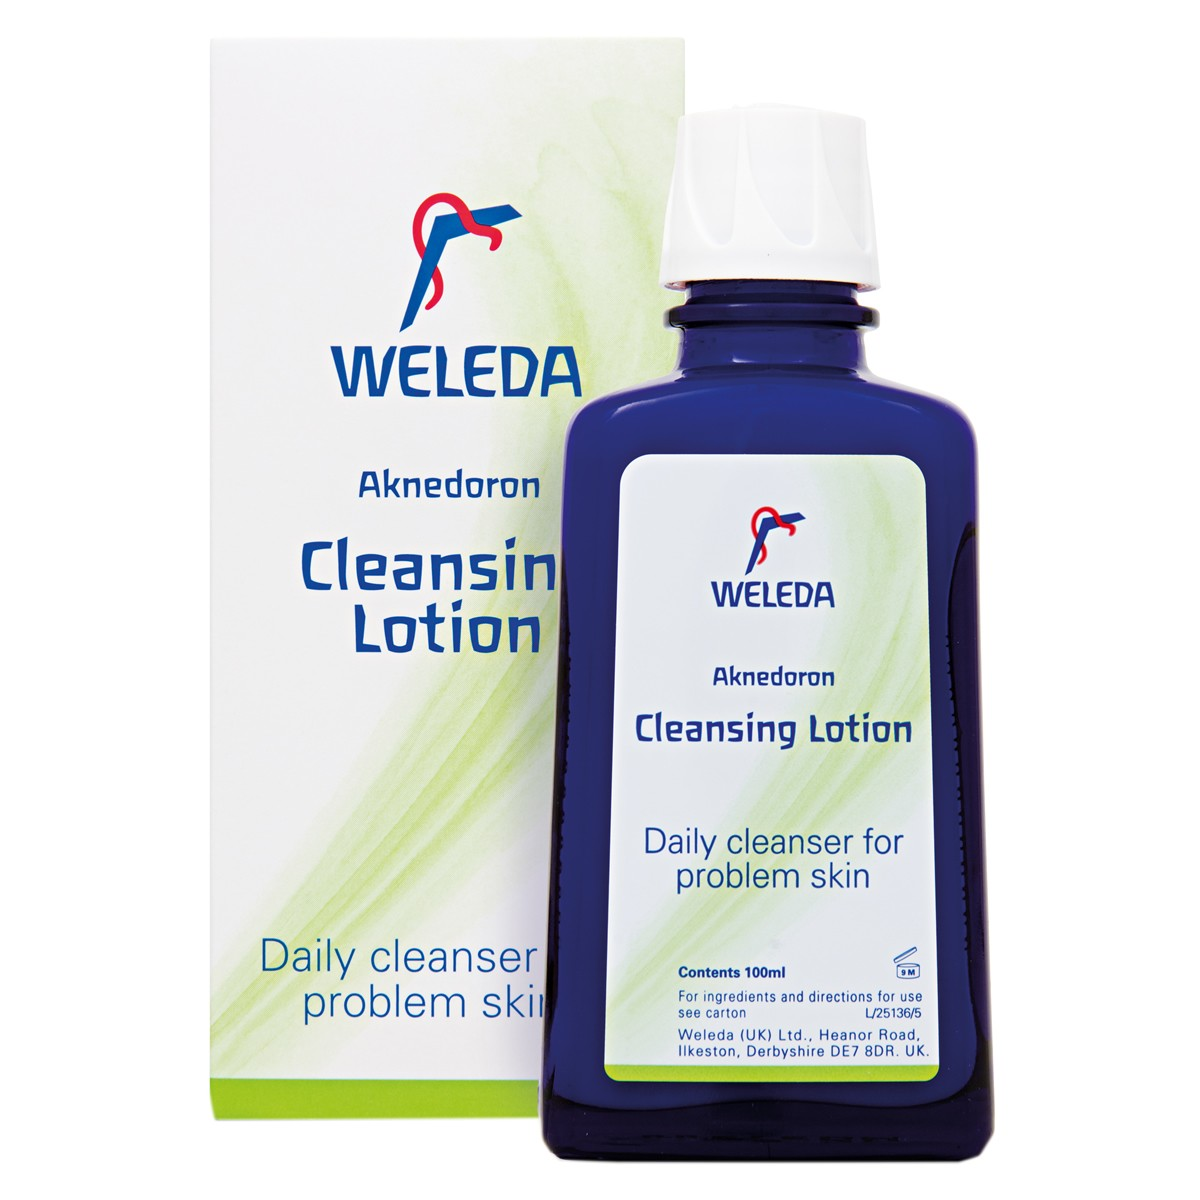 Weleda Aknedoron Cleansing Lotion